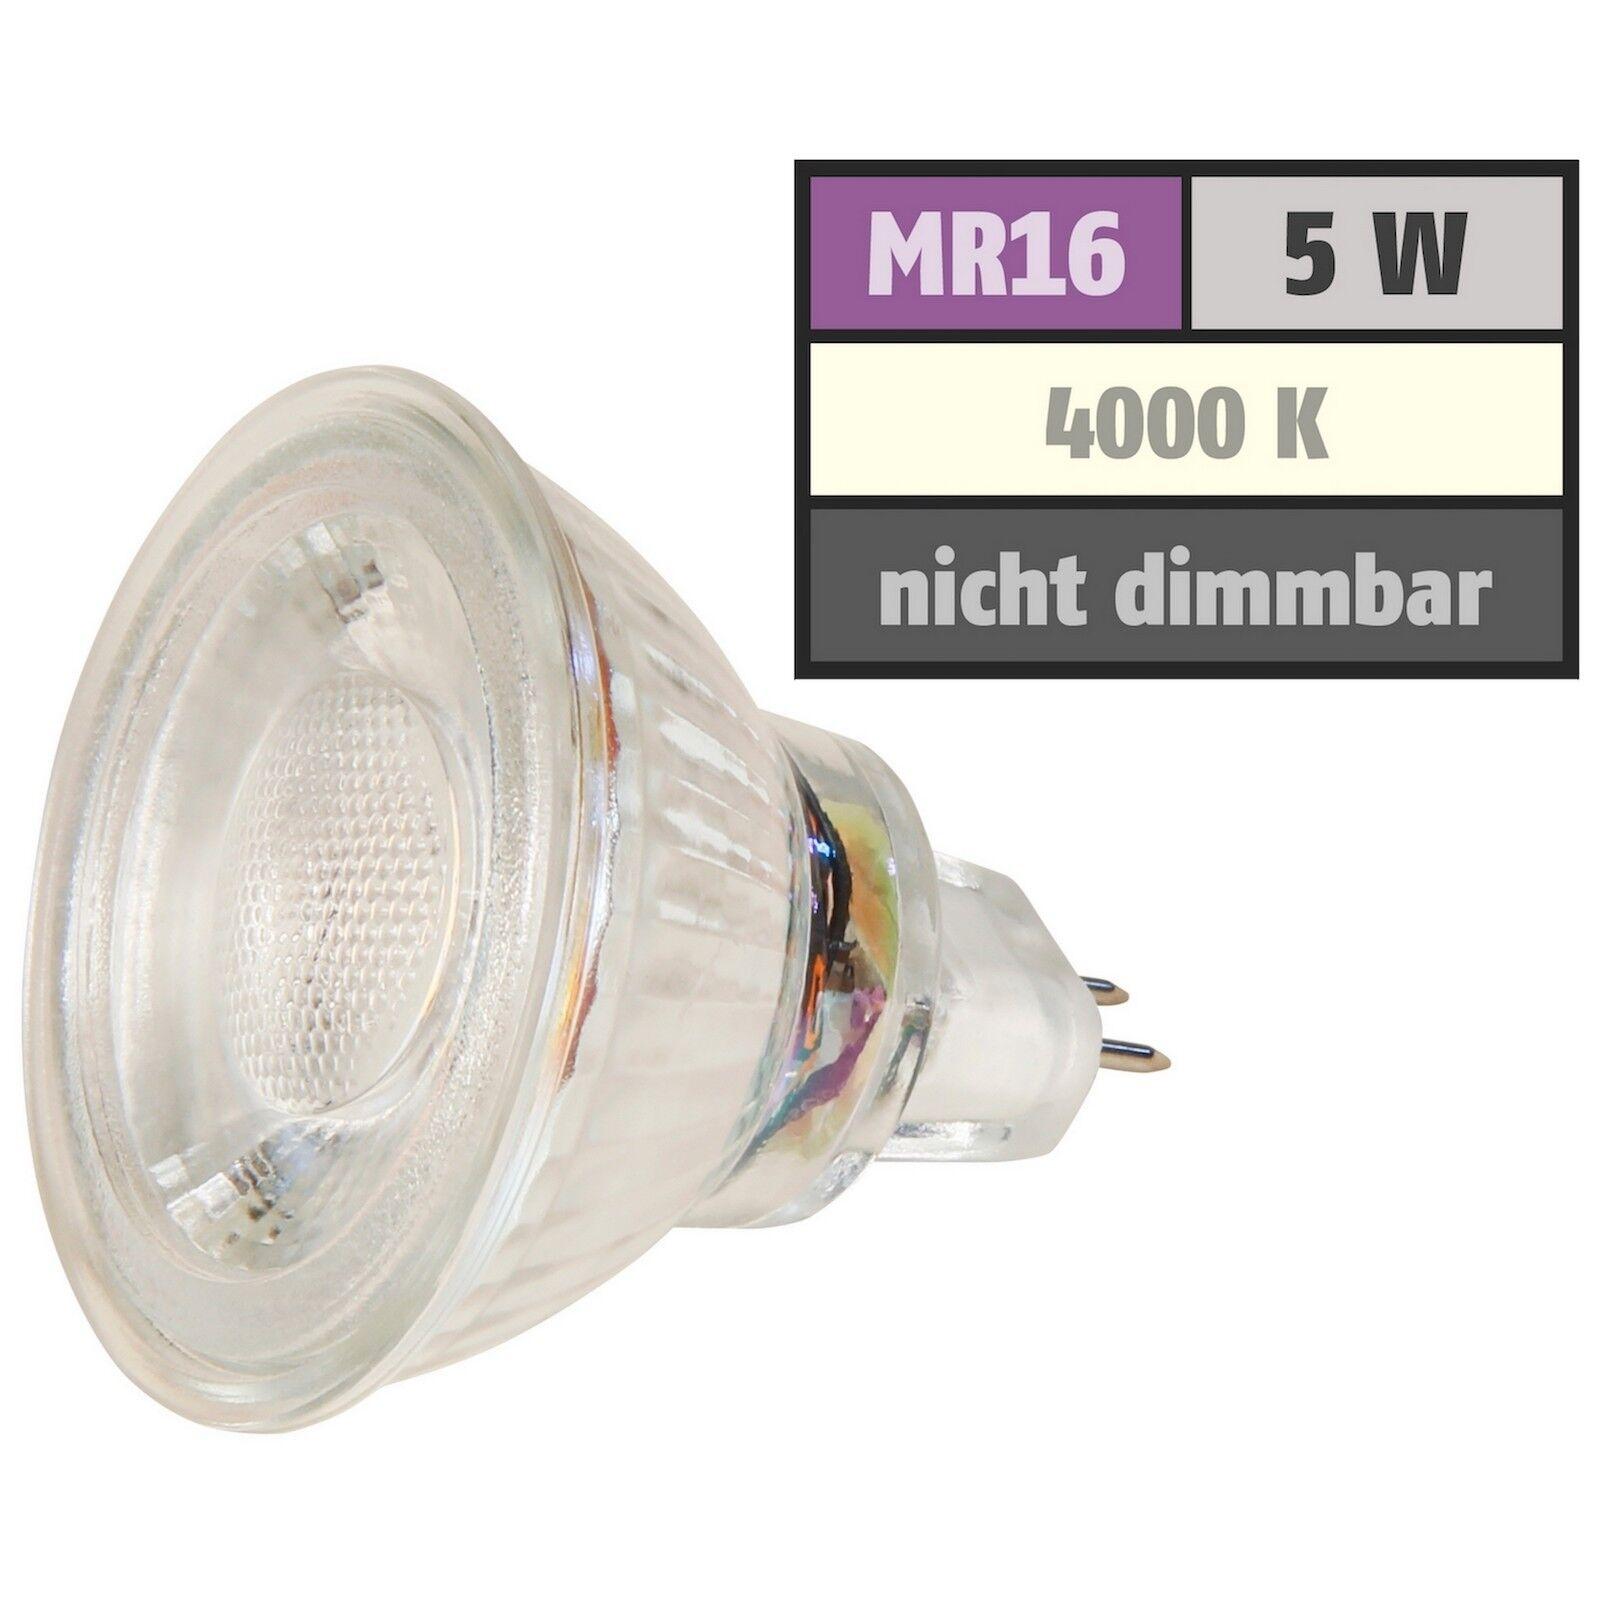 5W MCOB LED Leuchtmittel 12Volt   Niedervolt   Neutralweiss 4000k   Gu5.3   MR16